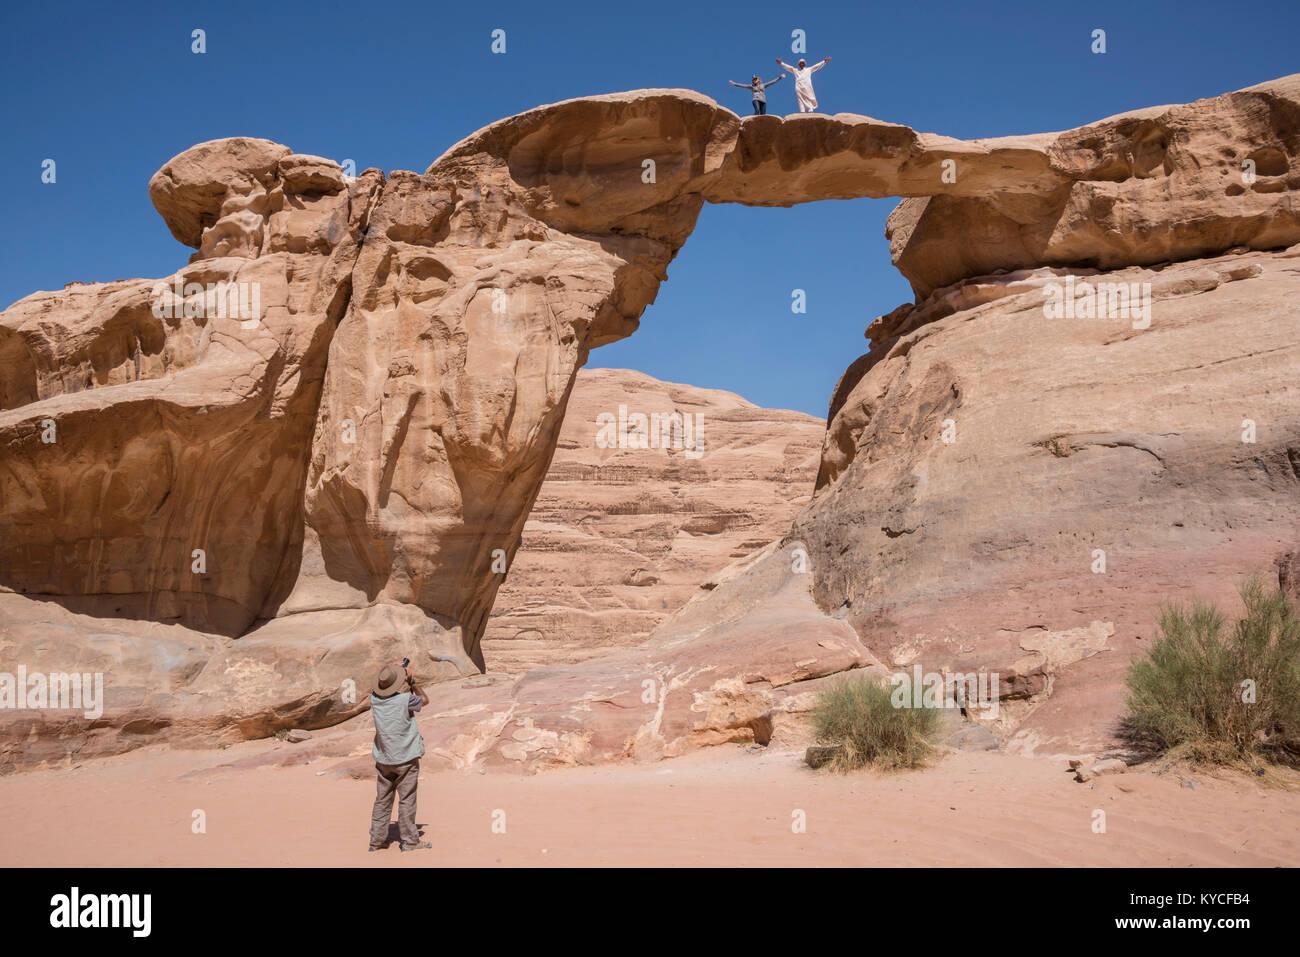 Tourists next to a Burdah bridge rock formation in the desert of Wadi Rum, Jordan - Stock Image